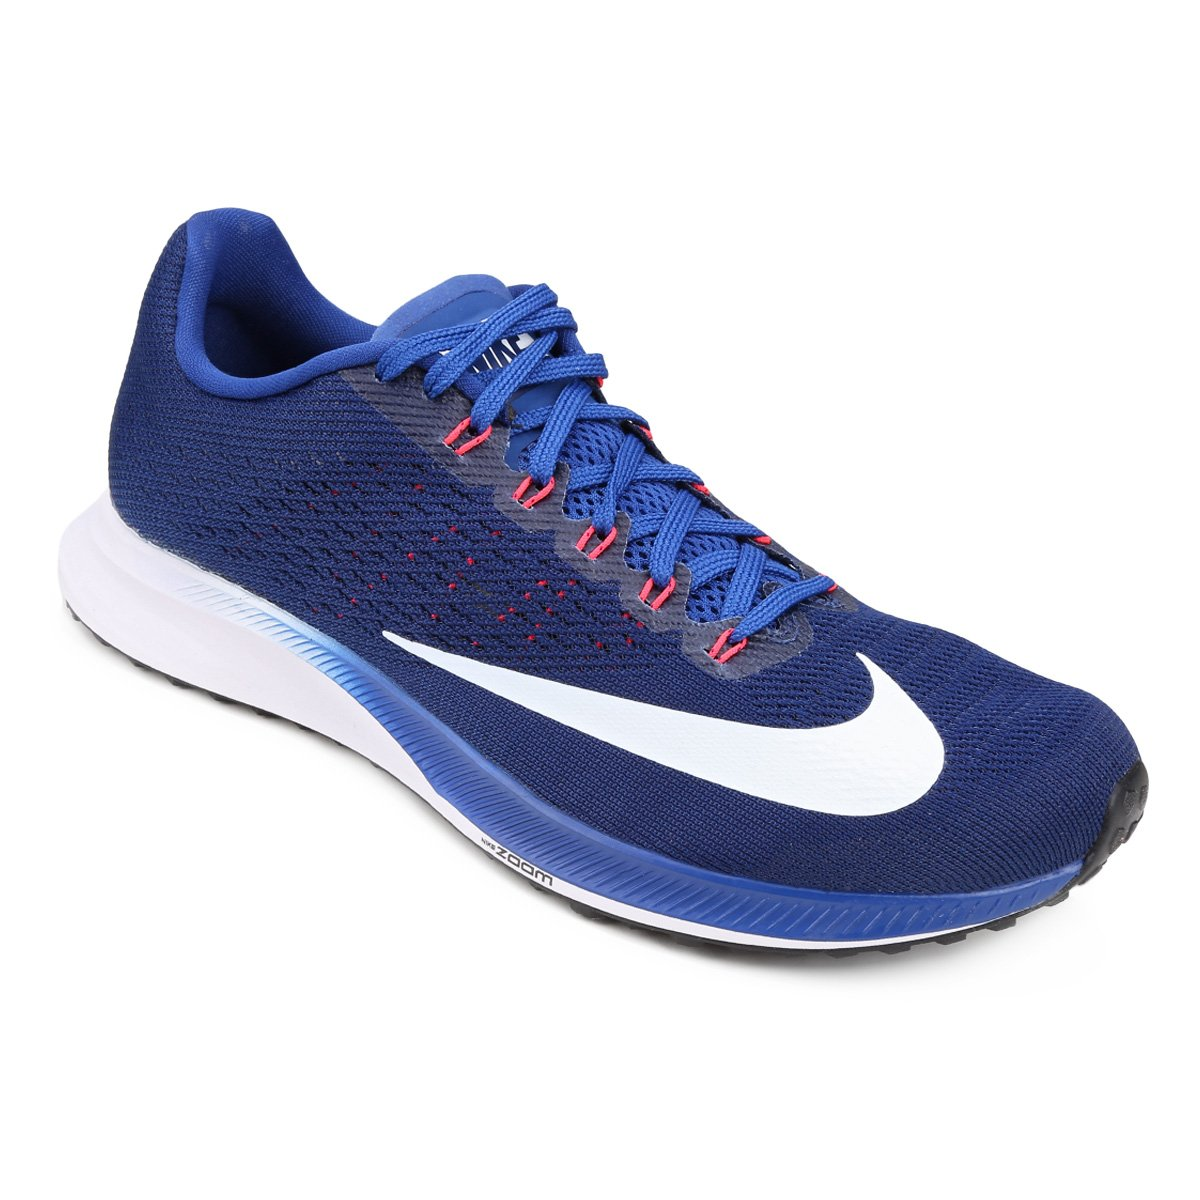 59d66c3256 Tênis Nike Air Zoom Elite 10 Masculino